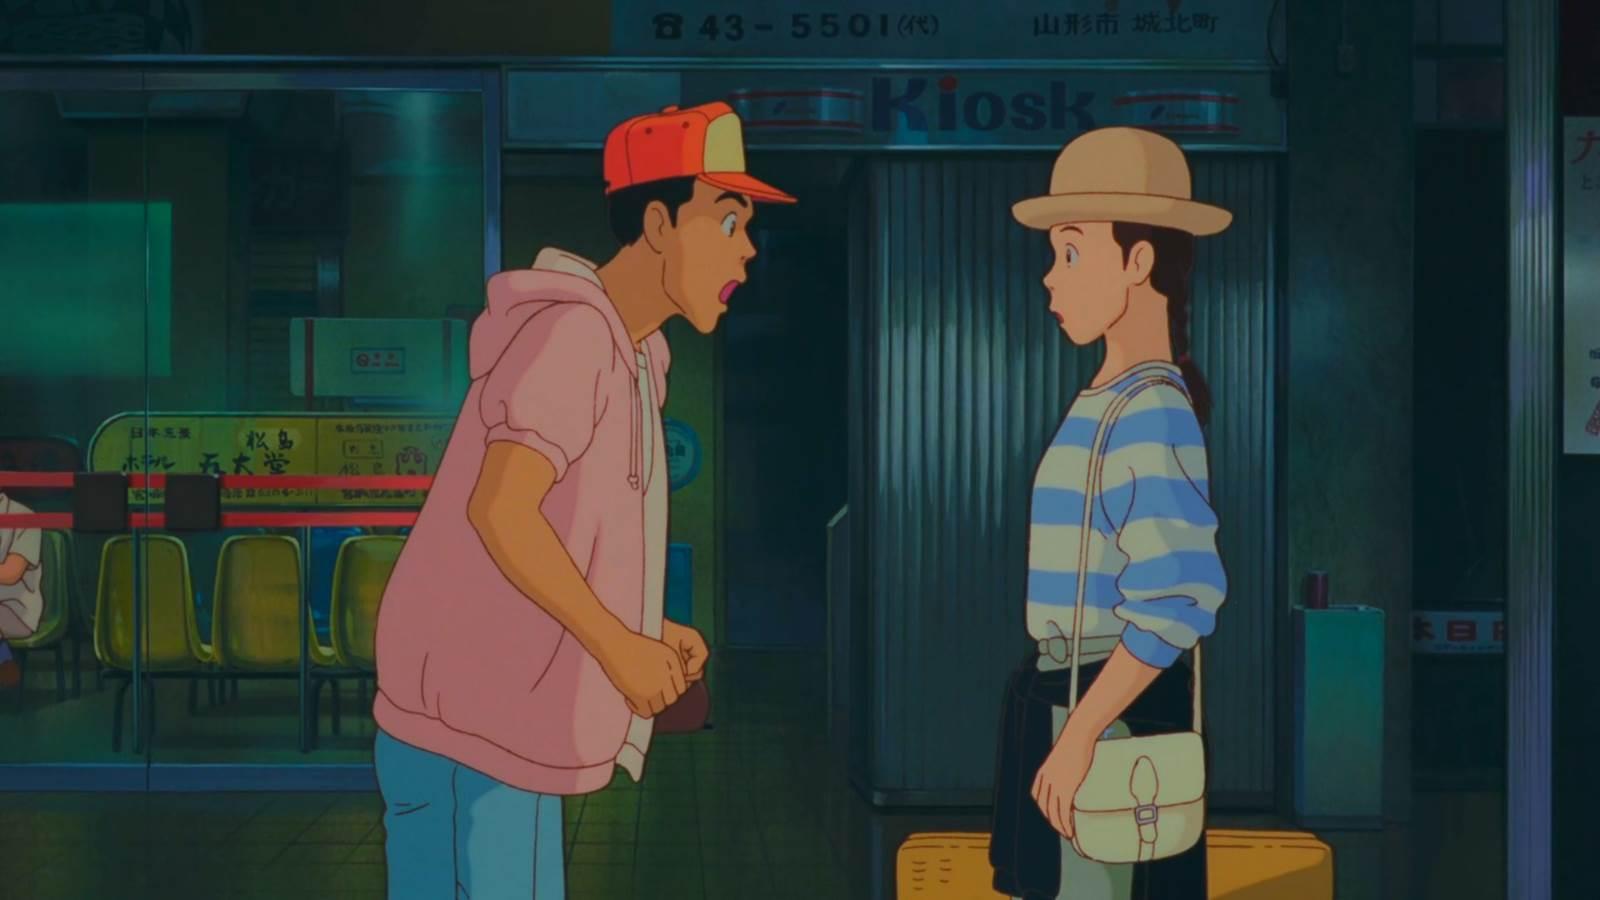 Omoide Poroporo, Taeko meets Toshio